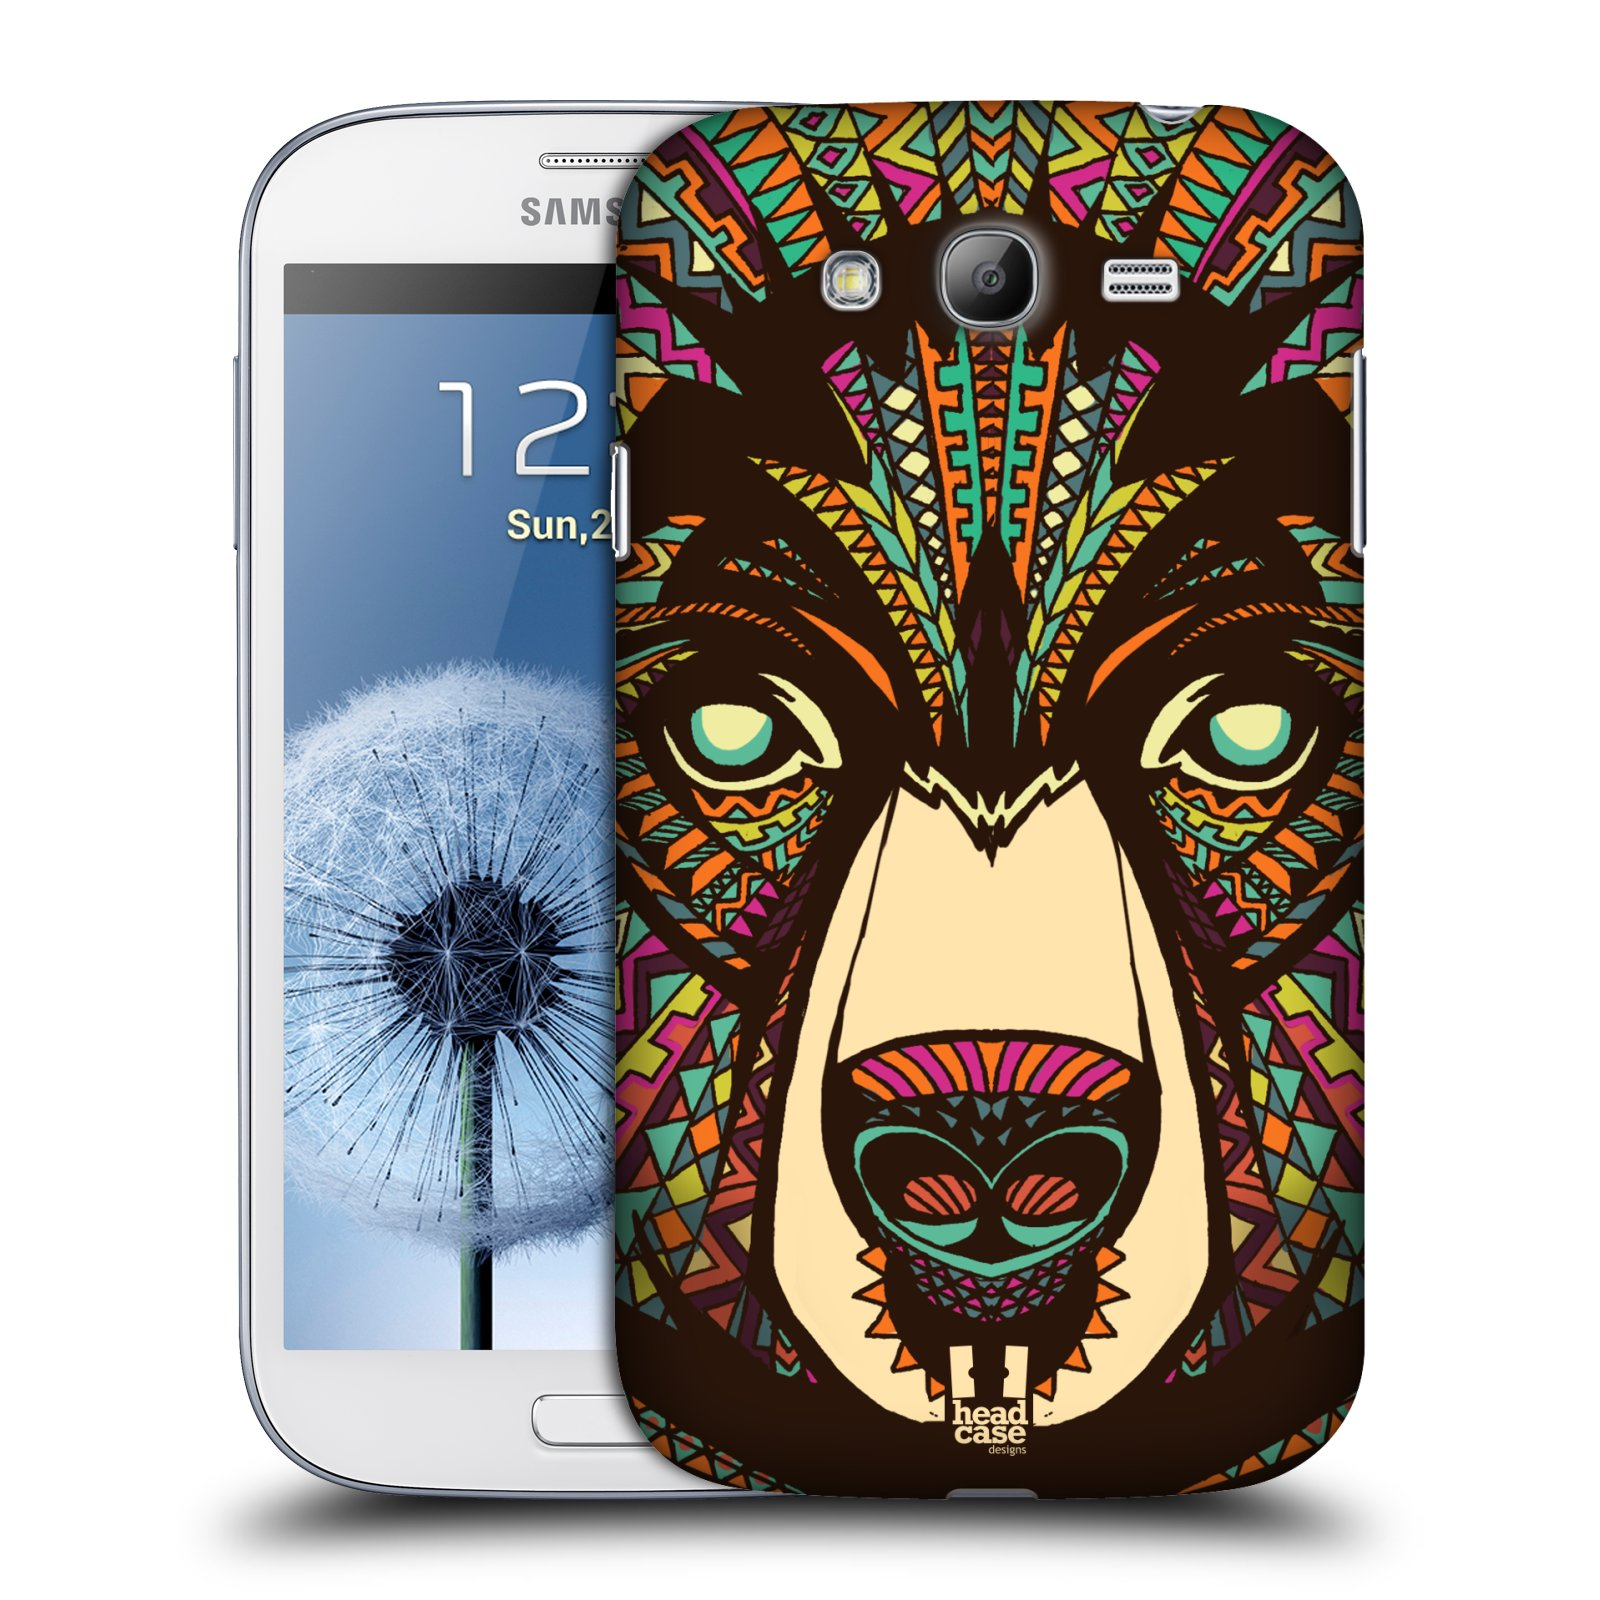 HEAD CASE plastový obal na mobil SAMSUNG GALAXY Grand i9080 vzor Aztécký motiv zvíře medvěd